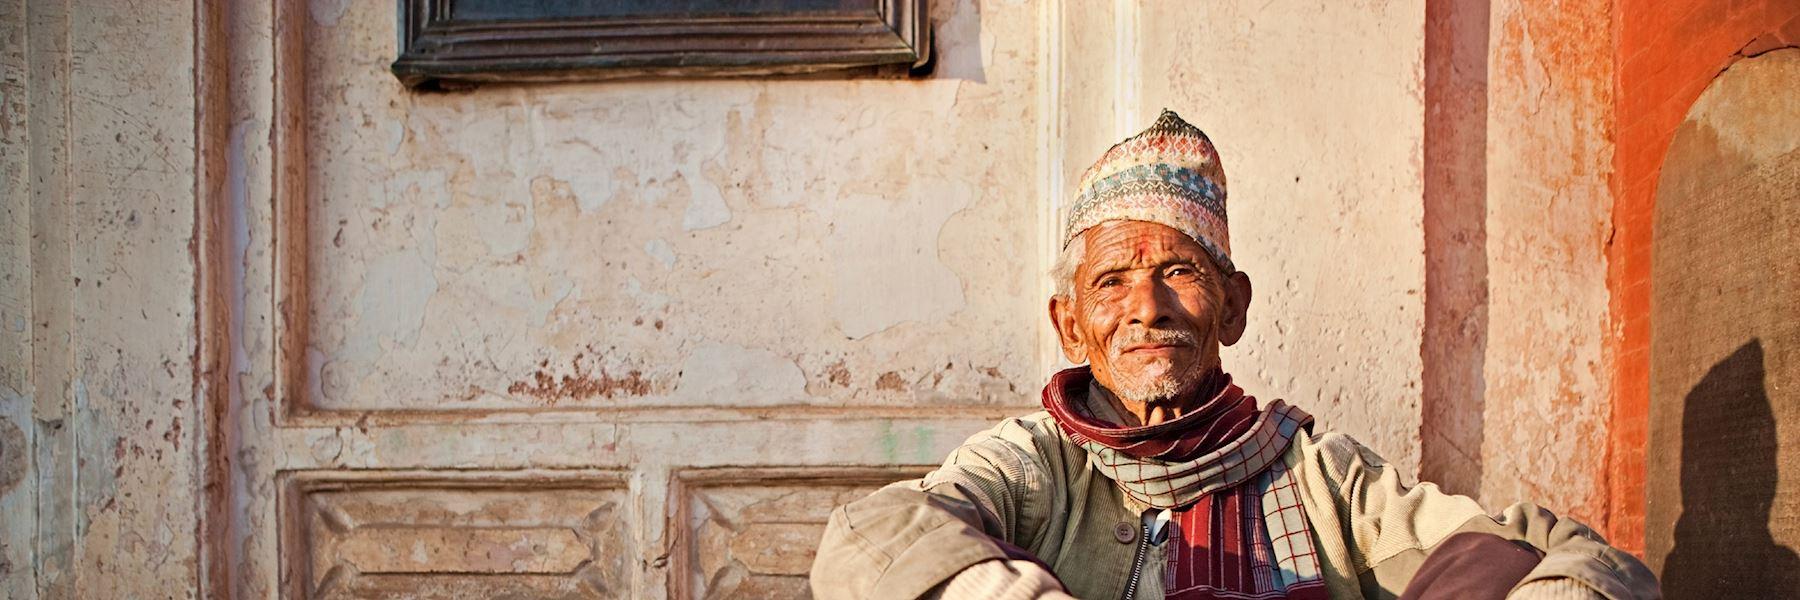 Nepal vacations  2019 & 2020